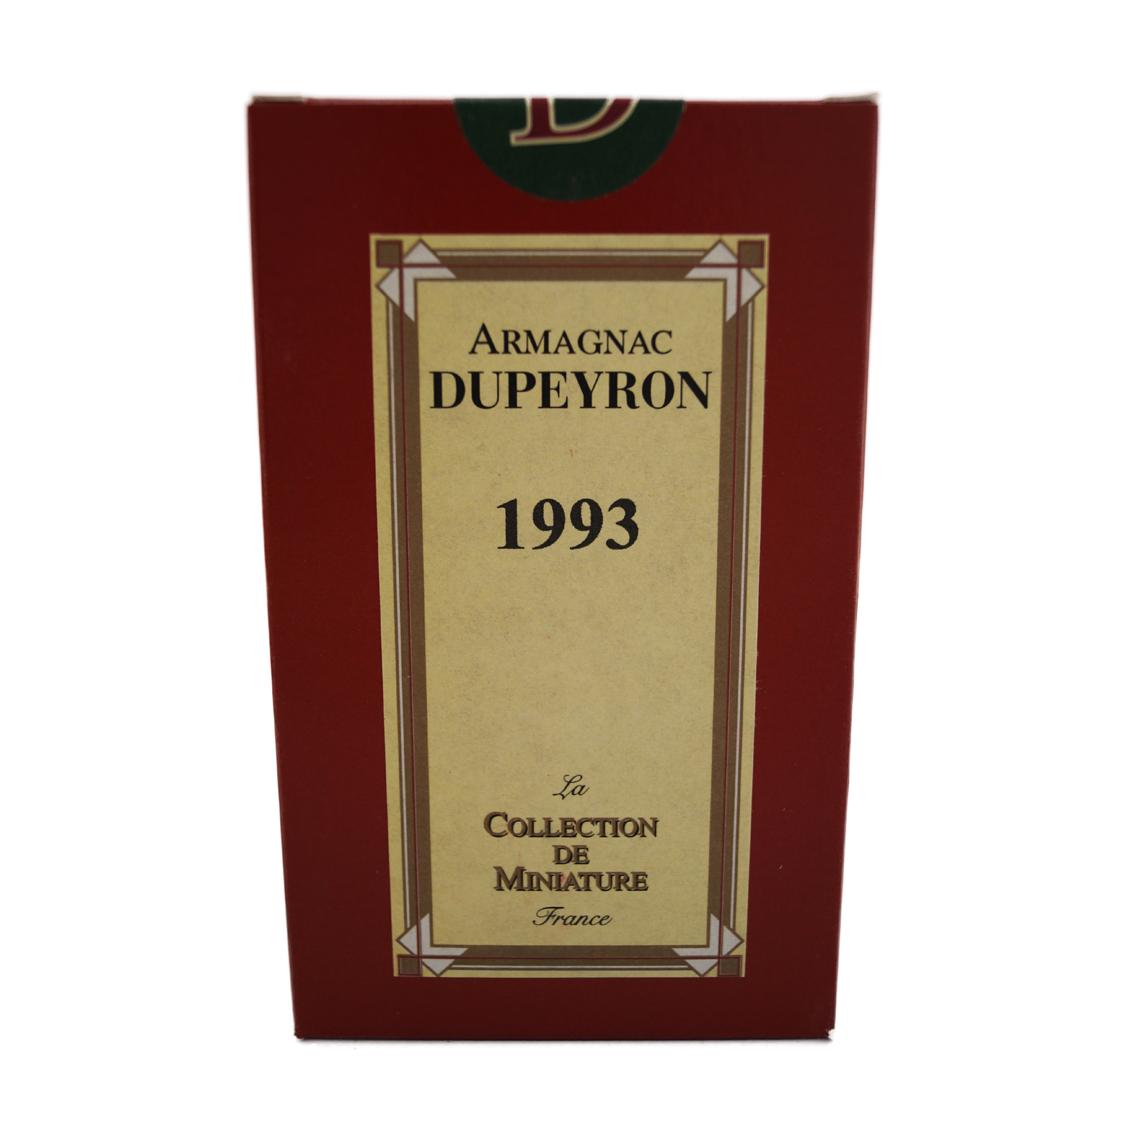 ARMAGNAC-DUPEYRON-1993-B